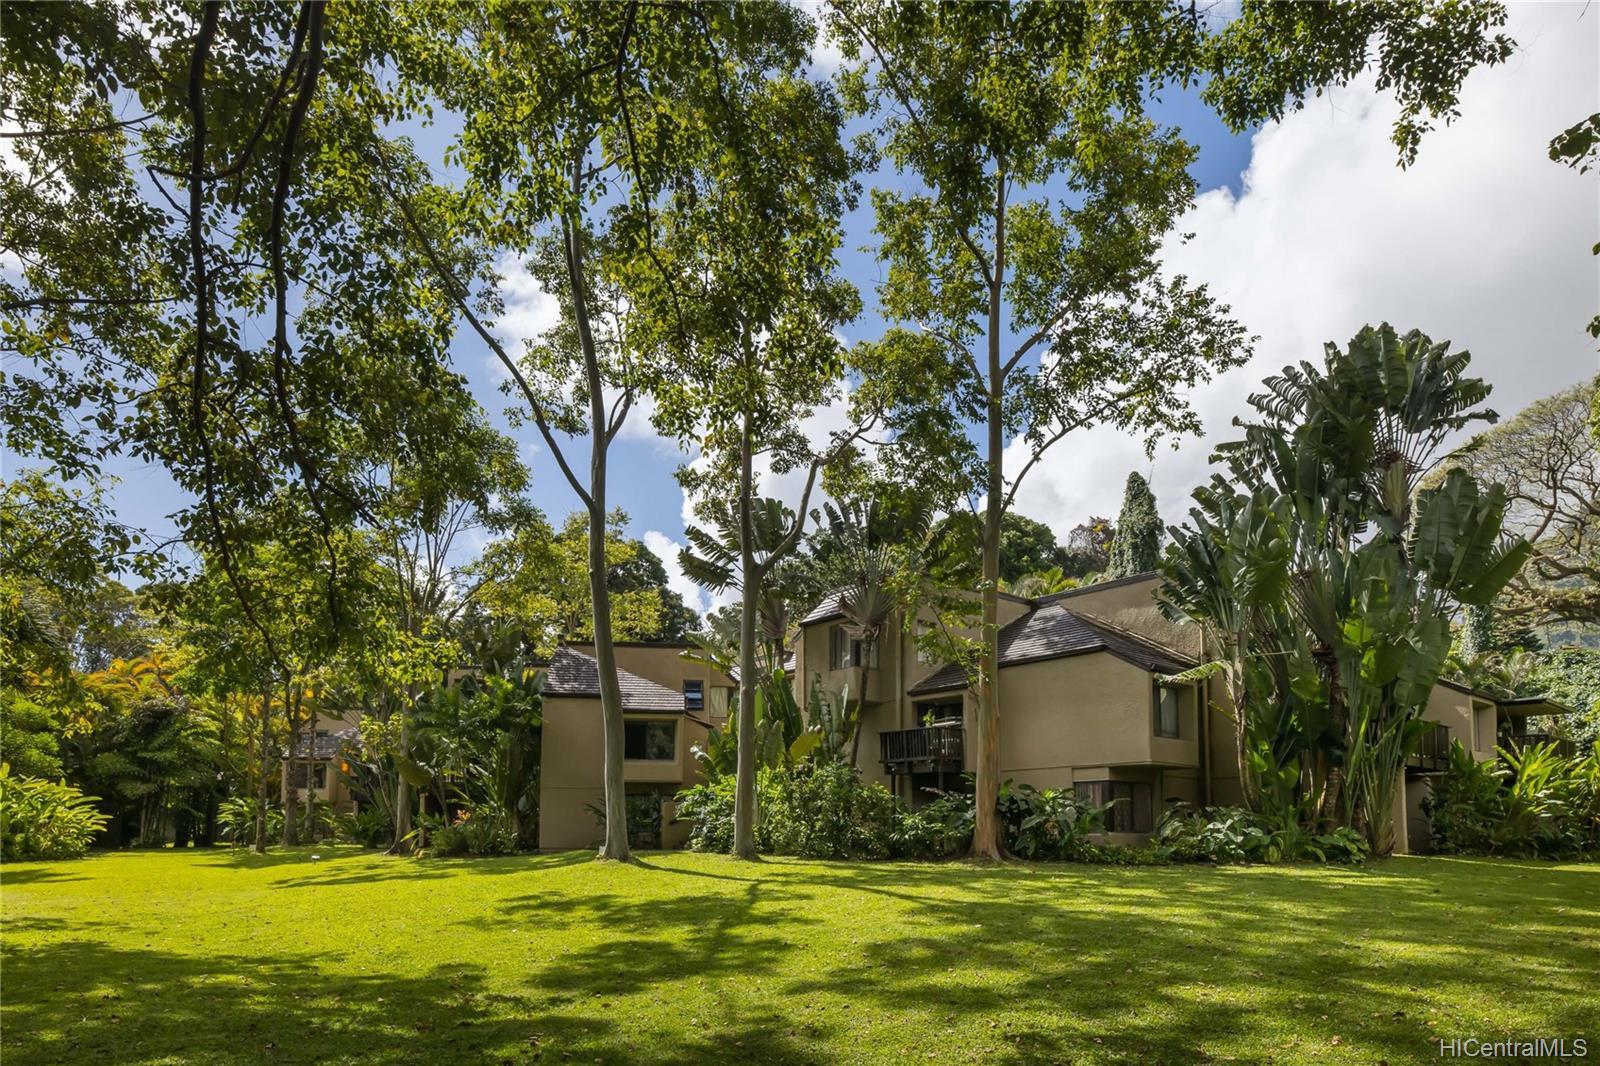 46-369 Haiku Road townhouse # H13, Kaneohe, Hawaii - photo 13 of 20